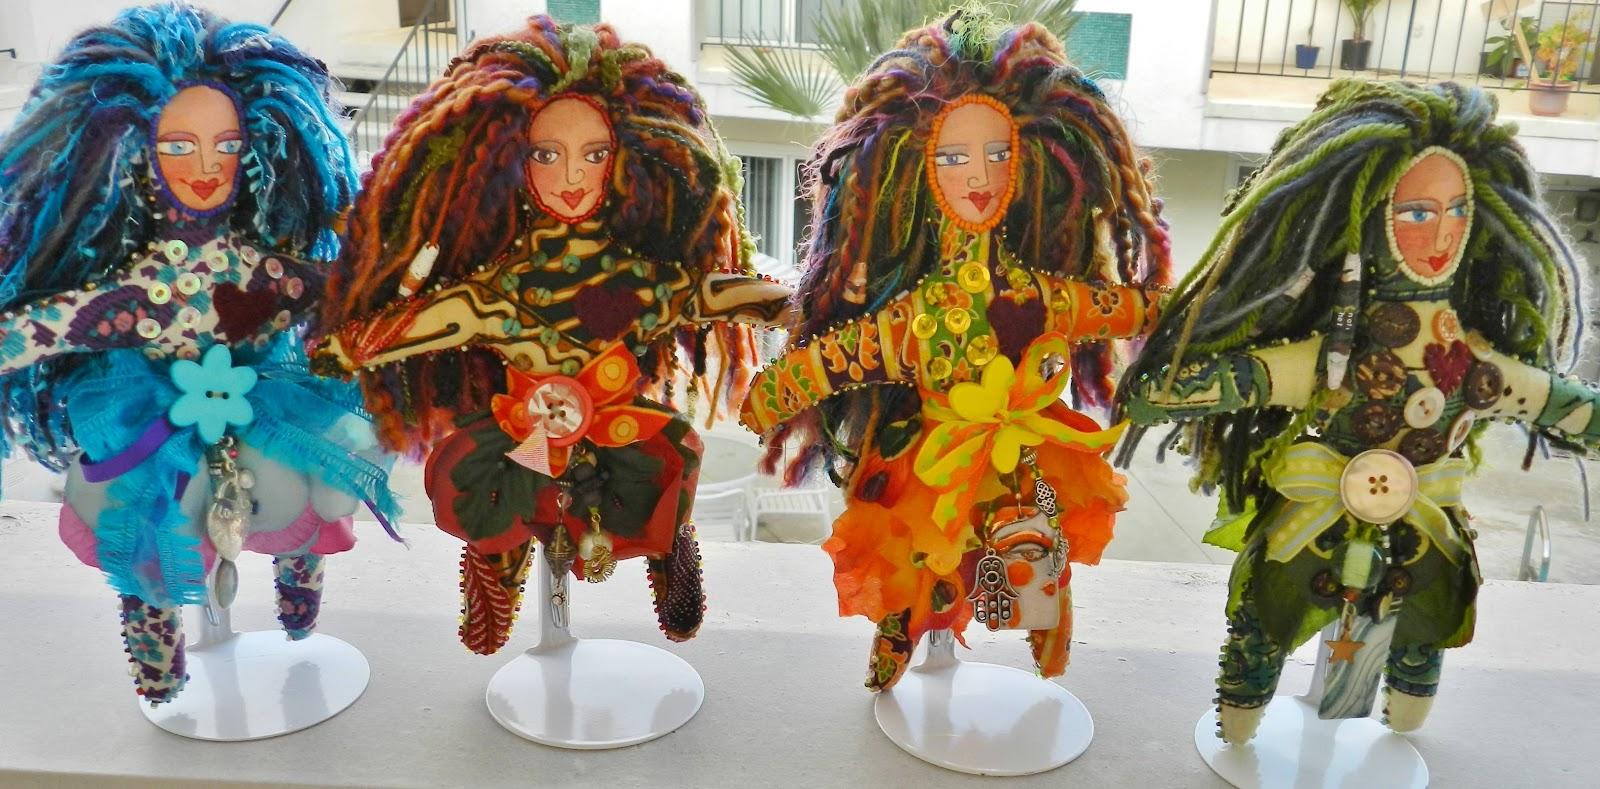 http://1.bp.blogspot.com/-7fg-YnTsIsw/T427rLfYtzI/AAAAAAAAACM/G08ZDjZH_Jo/s1600/Custom-Toys-Craft-Dolls-Wallpaper-10.JPG